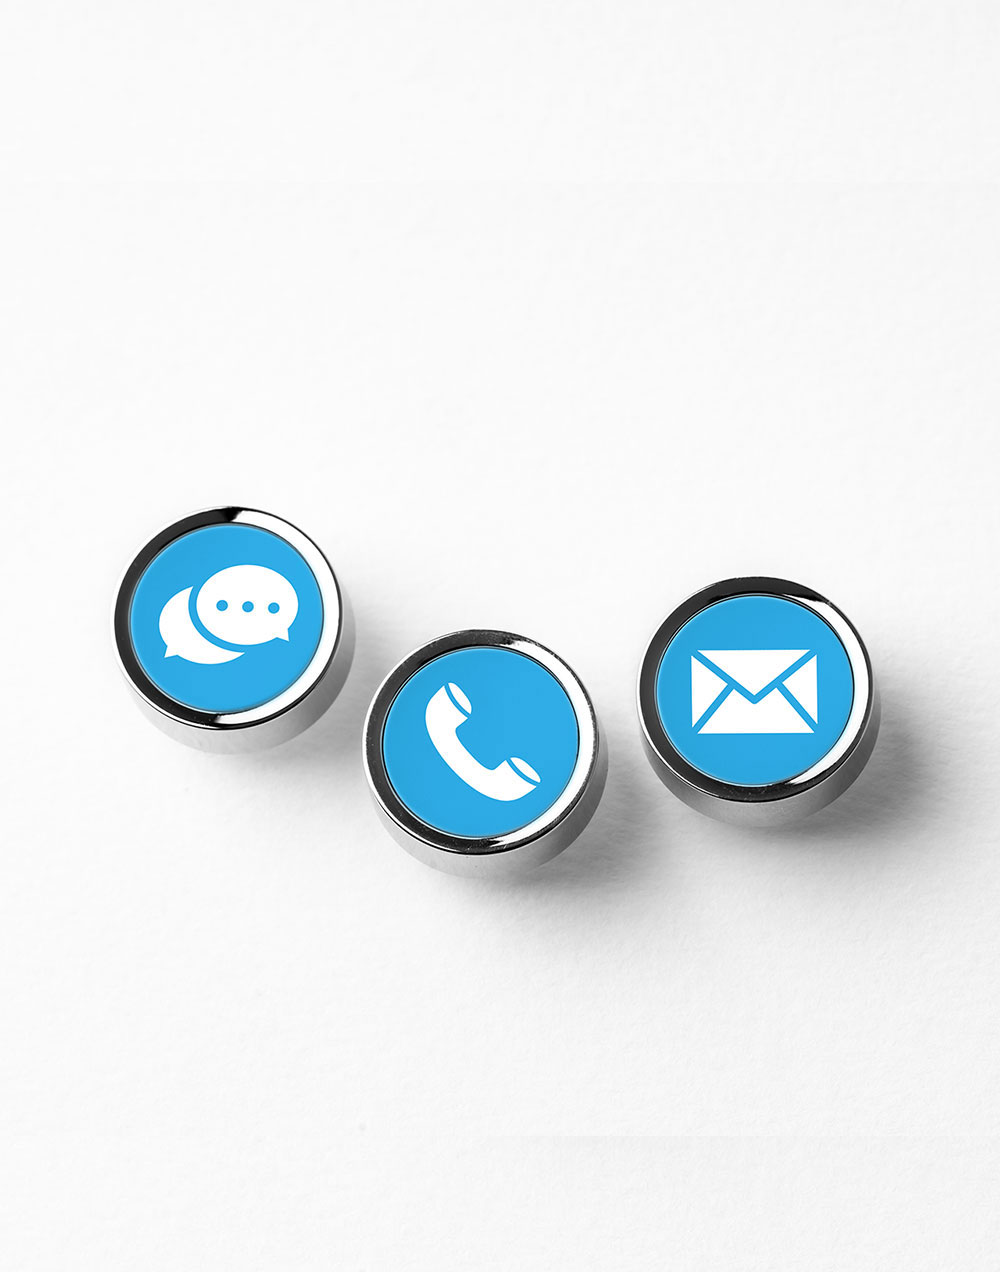 call-and-omnichannel-contact-center-primetelco